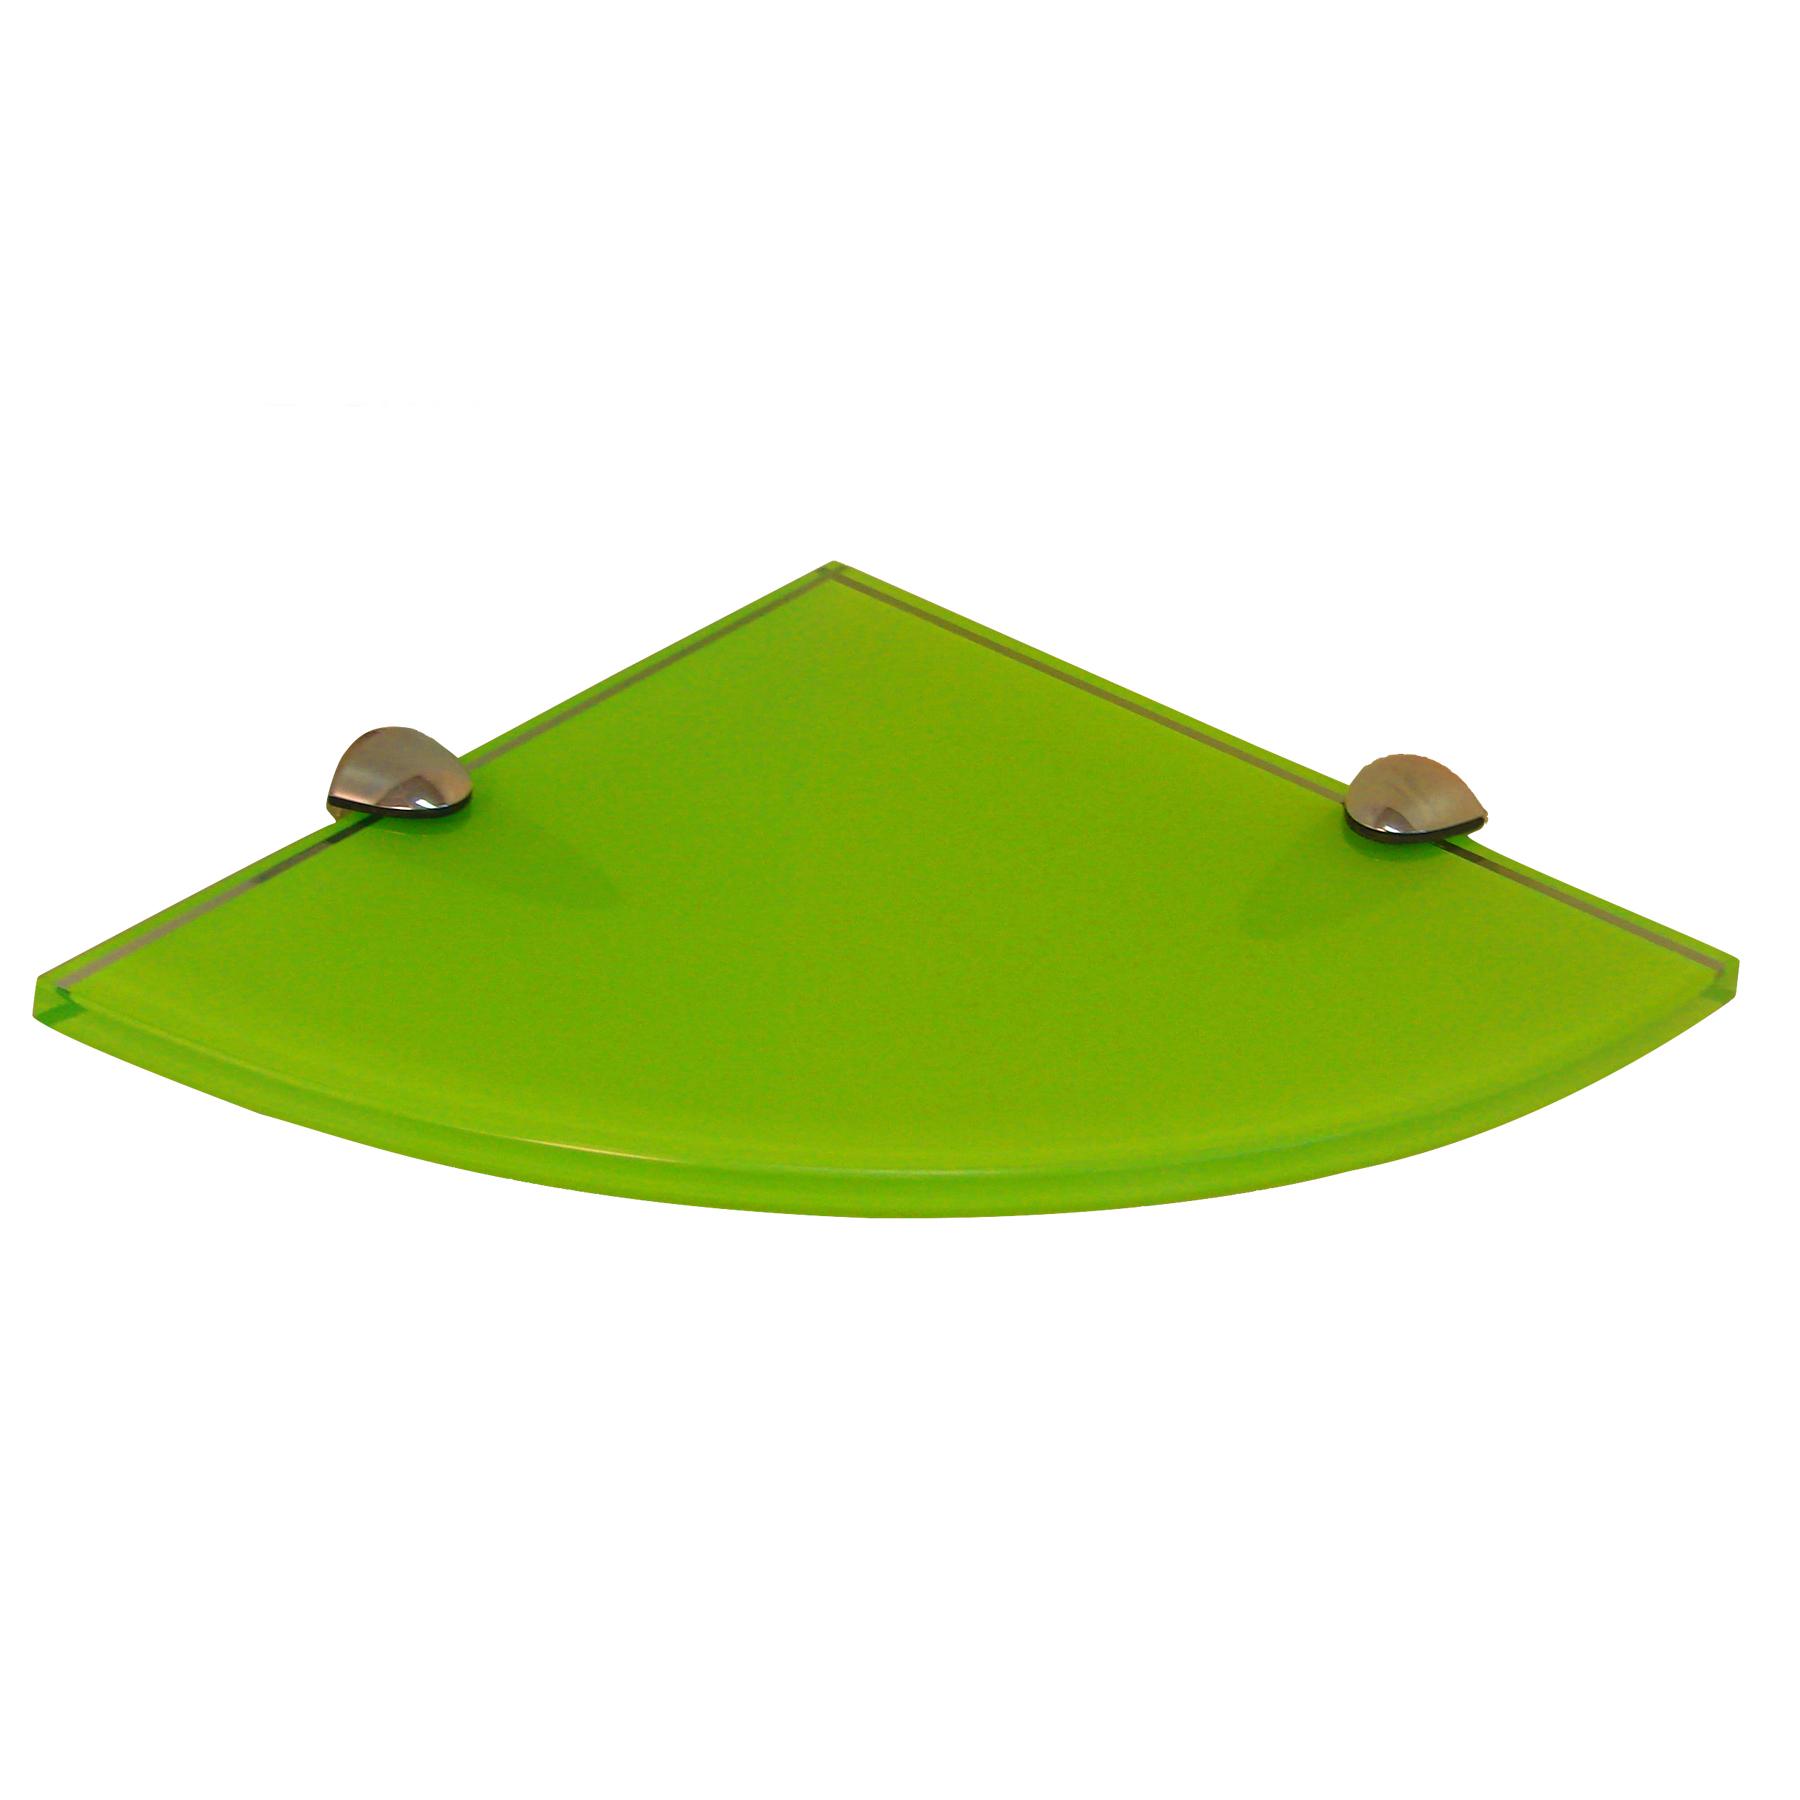 fab glass and mirror quarter circle corner floating green glass shelf w bracket ebay. Black Bedroom Furniture Sets. Home Design Ideas